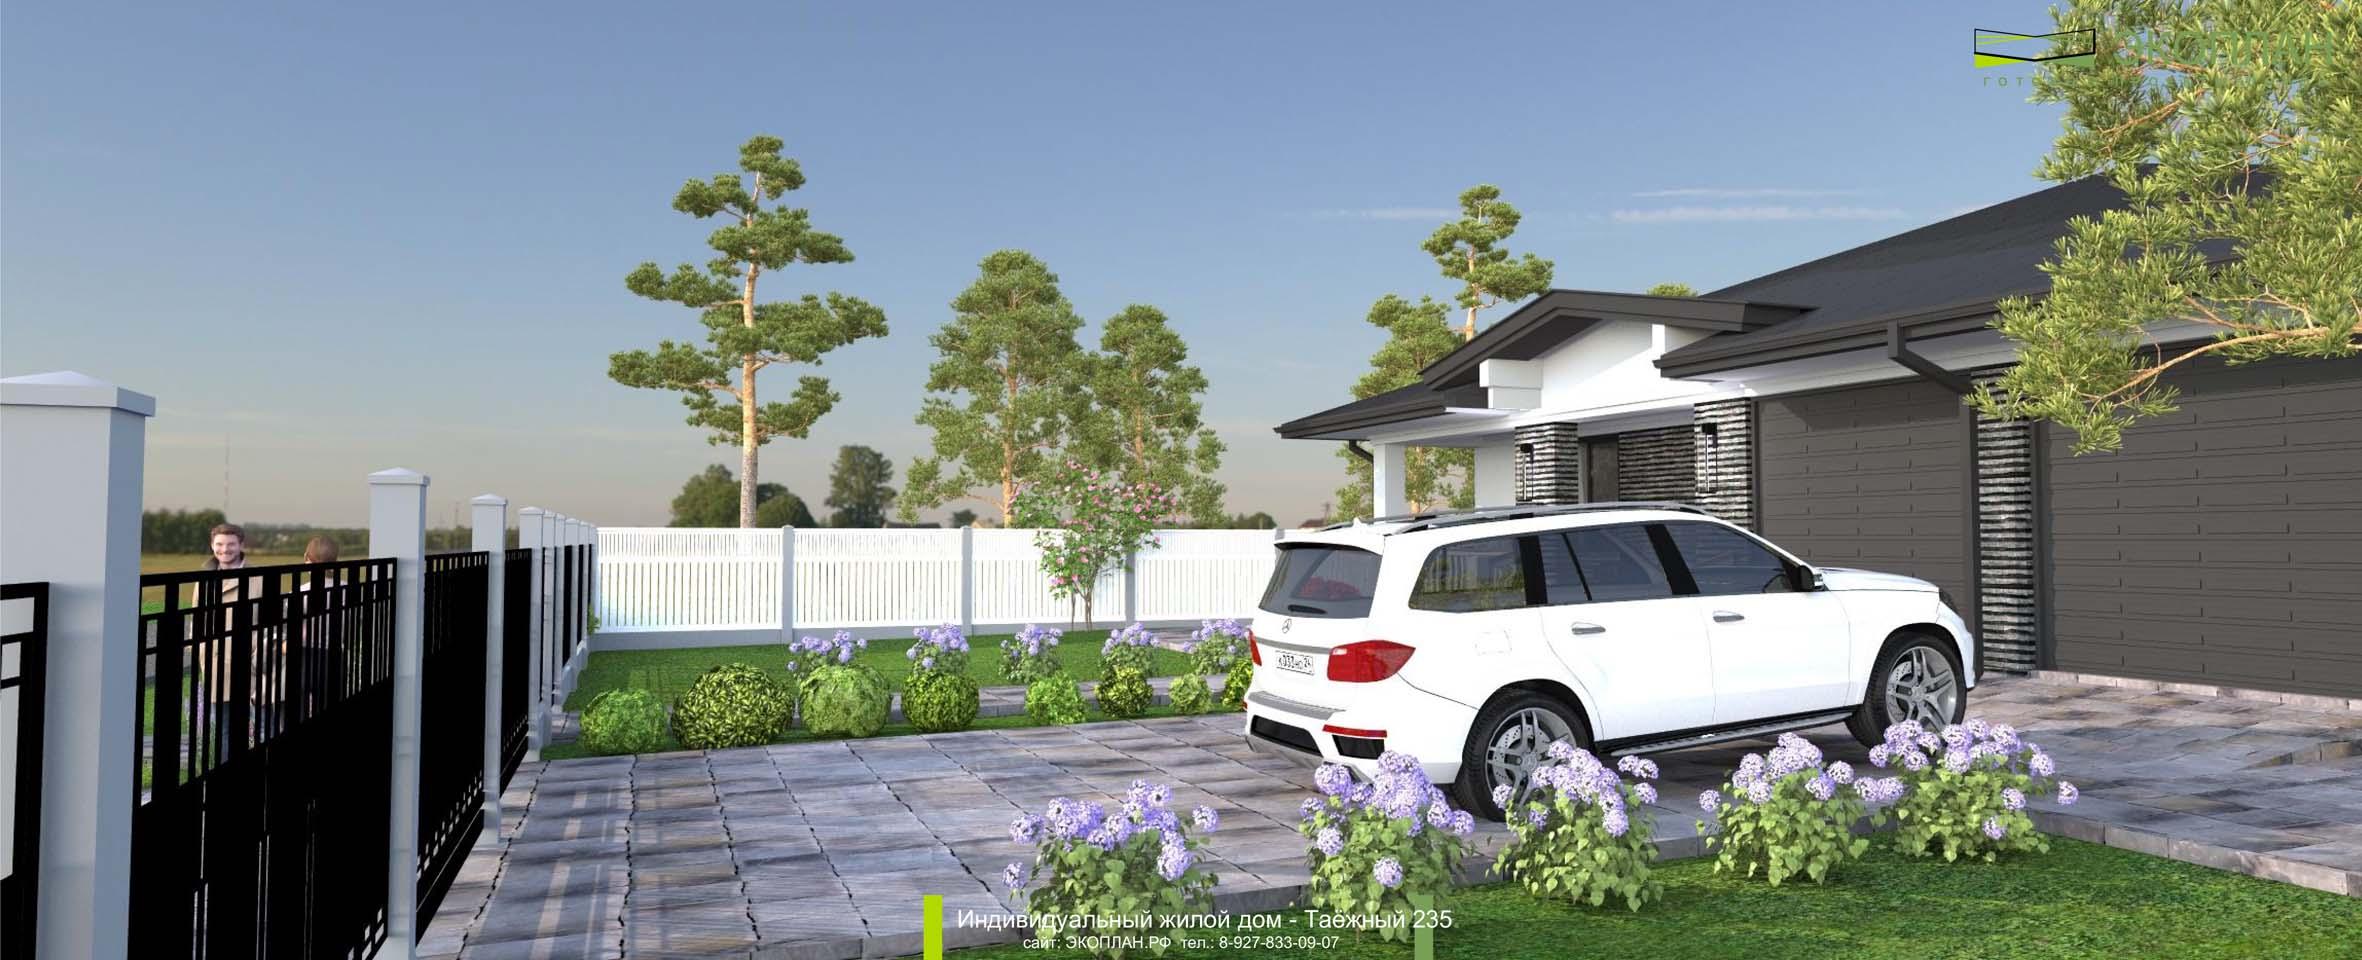 Готовый проект дома - Таёжный 235 - Экоплан.рф фасад